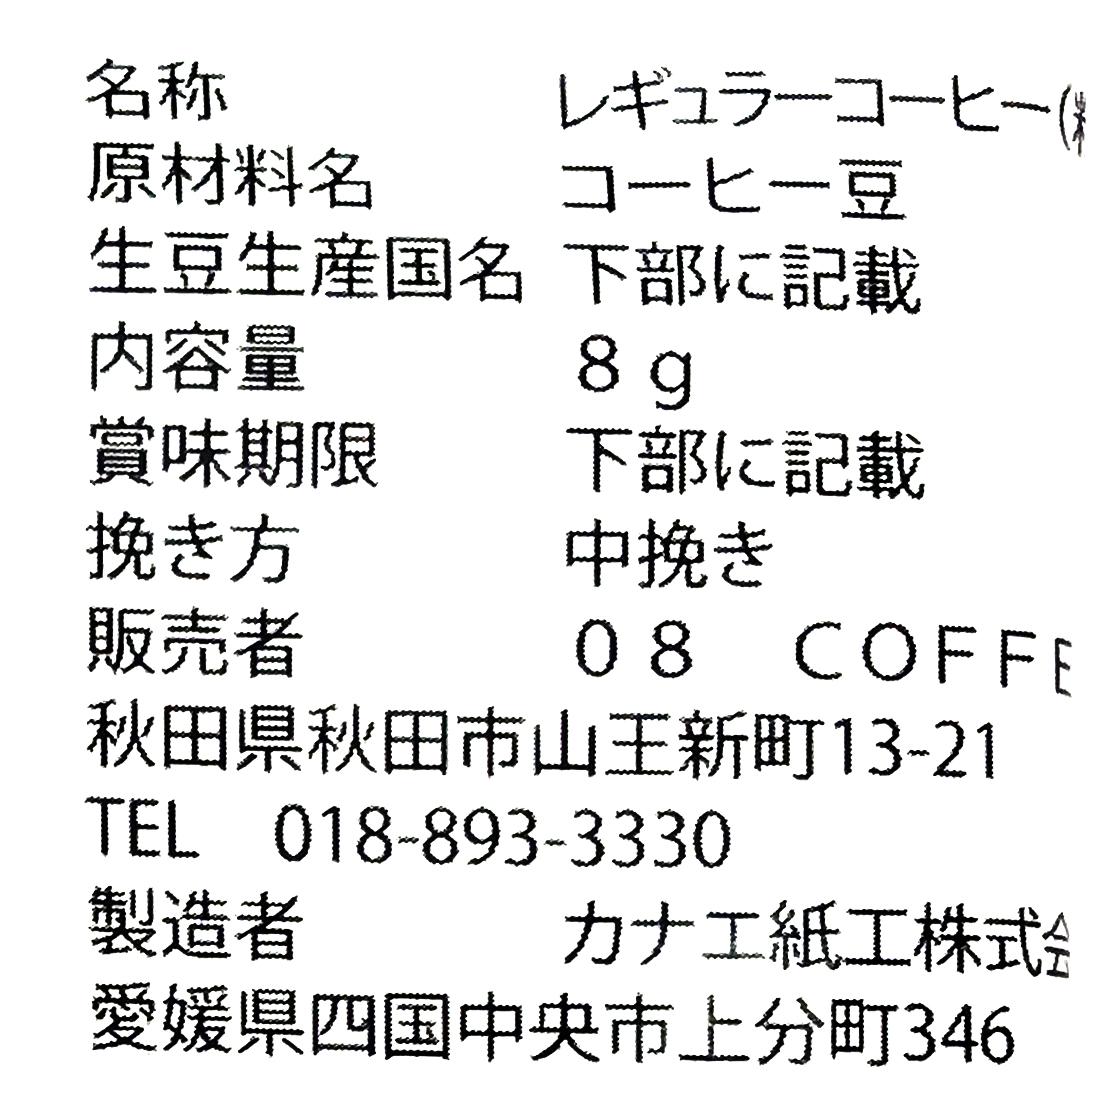 COFFEE BAG 15個入[ゼロハチコーヒー] 20